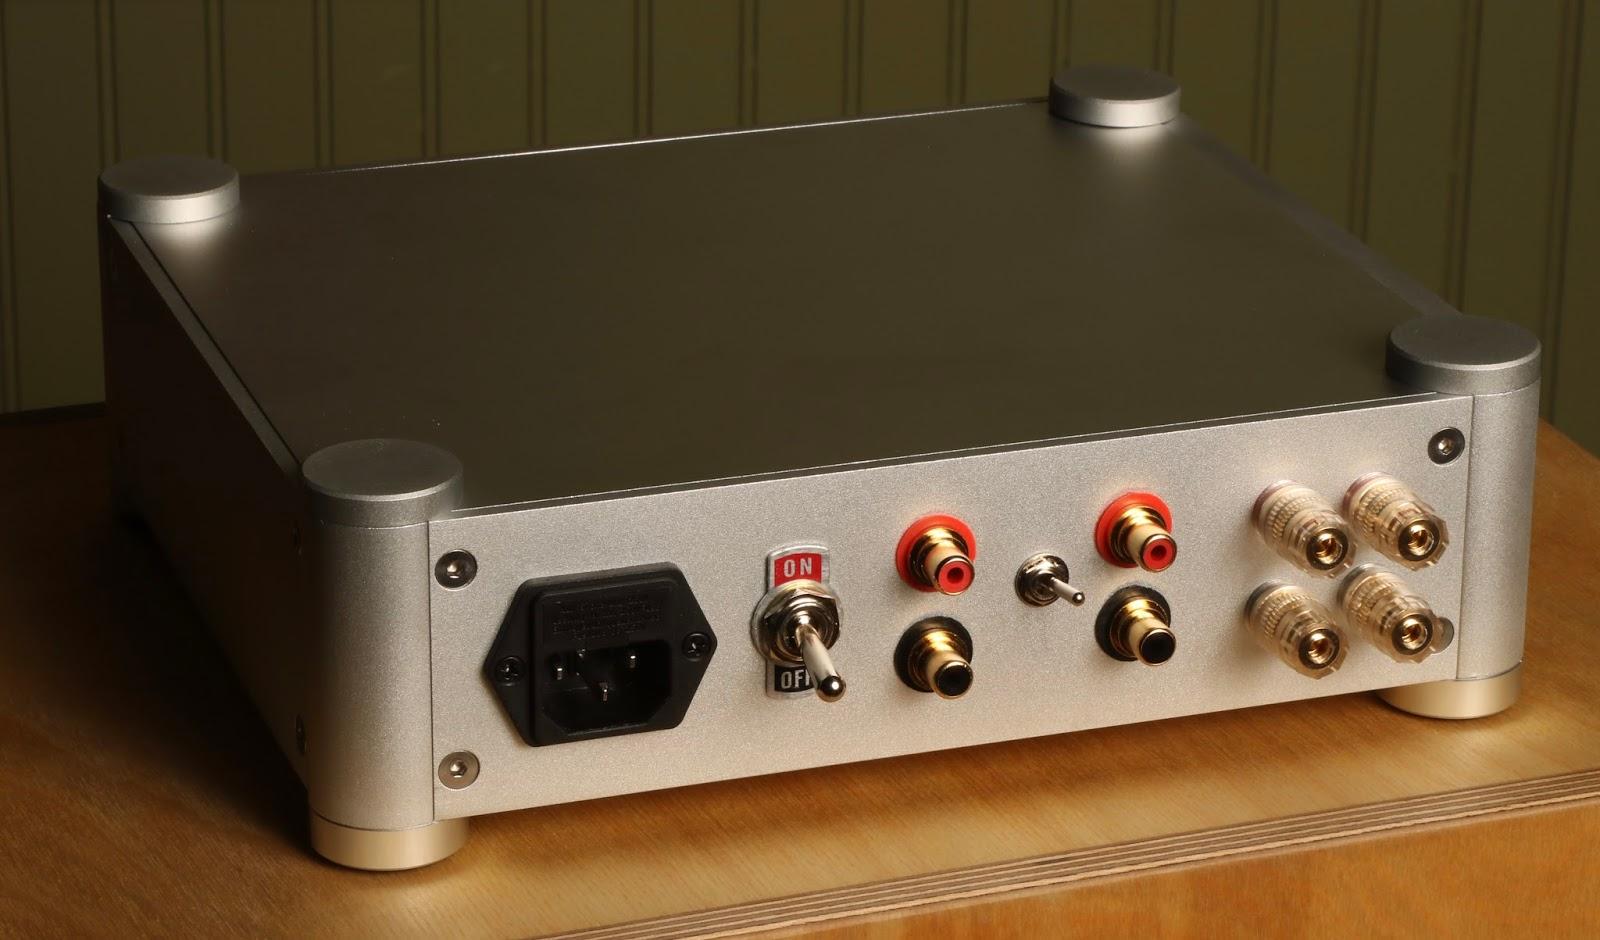 Fleawatt Class D Amplifier Circuit Tpa3116d2 Tpa3118d2 Subwoofer Elna Silmic Ii Power Supply Capacitors Regulated With 4700uf Additional Capacitance